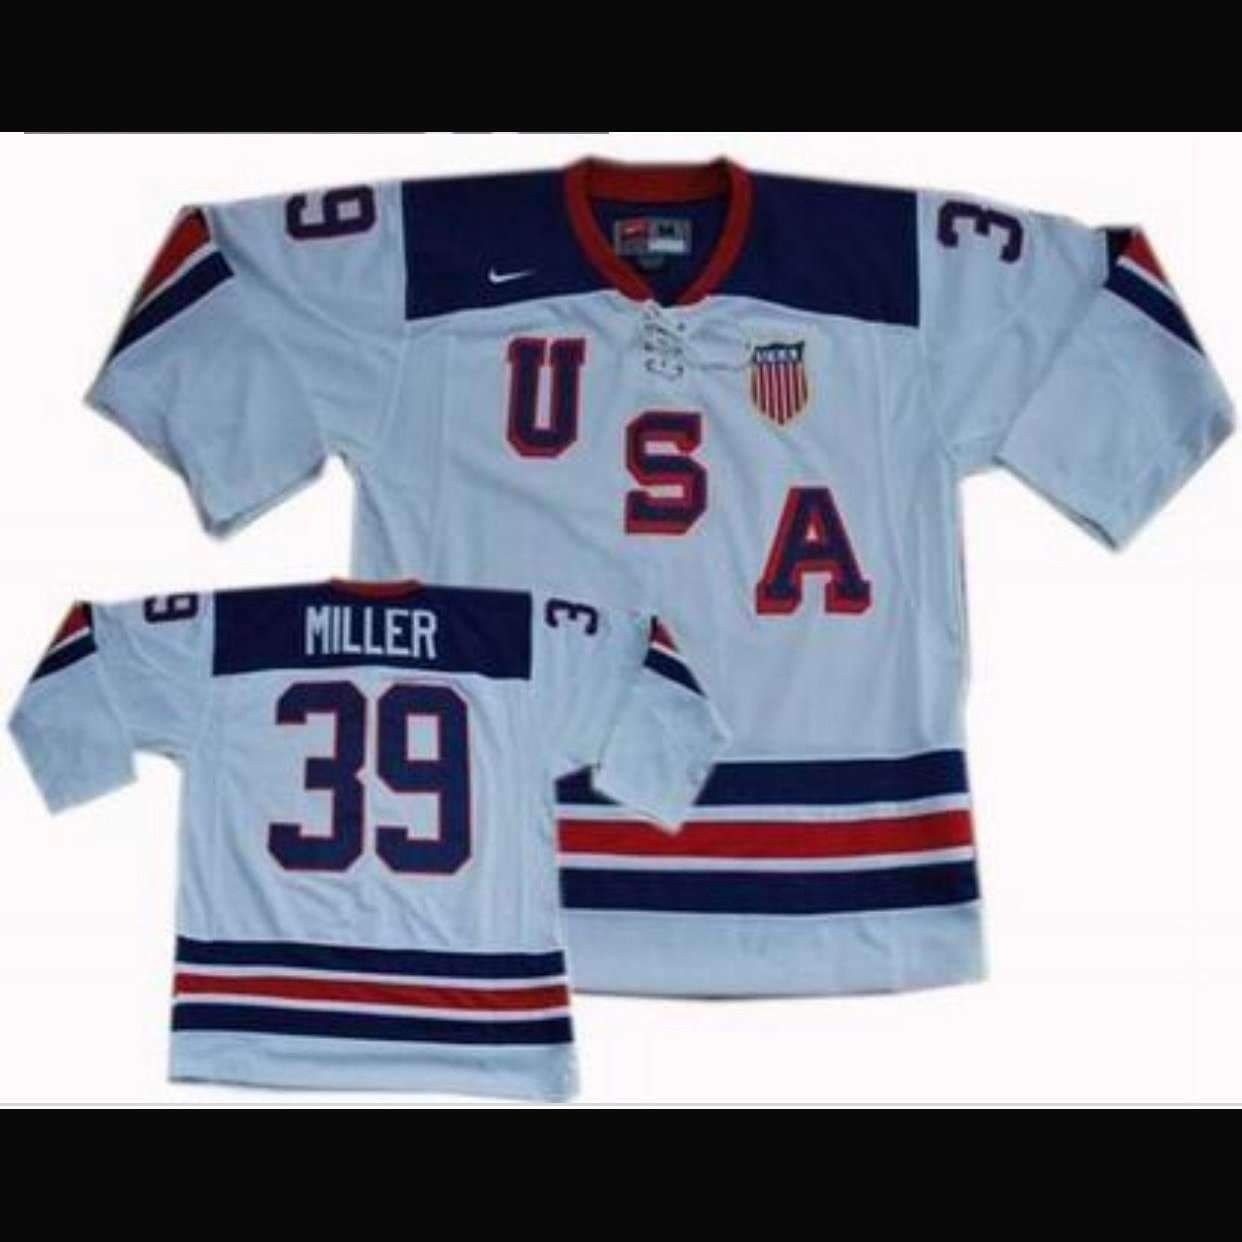 2010 Vancouver Olympics Team Usa Hockey Jersey Patrick Kane More Team Usa Hockey Olympic Hockey Team Usa